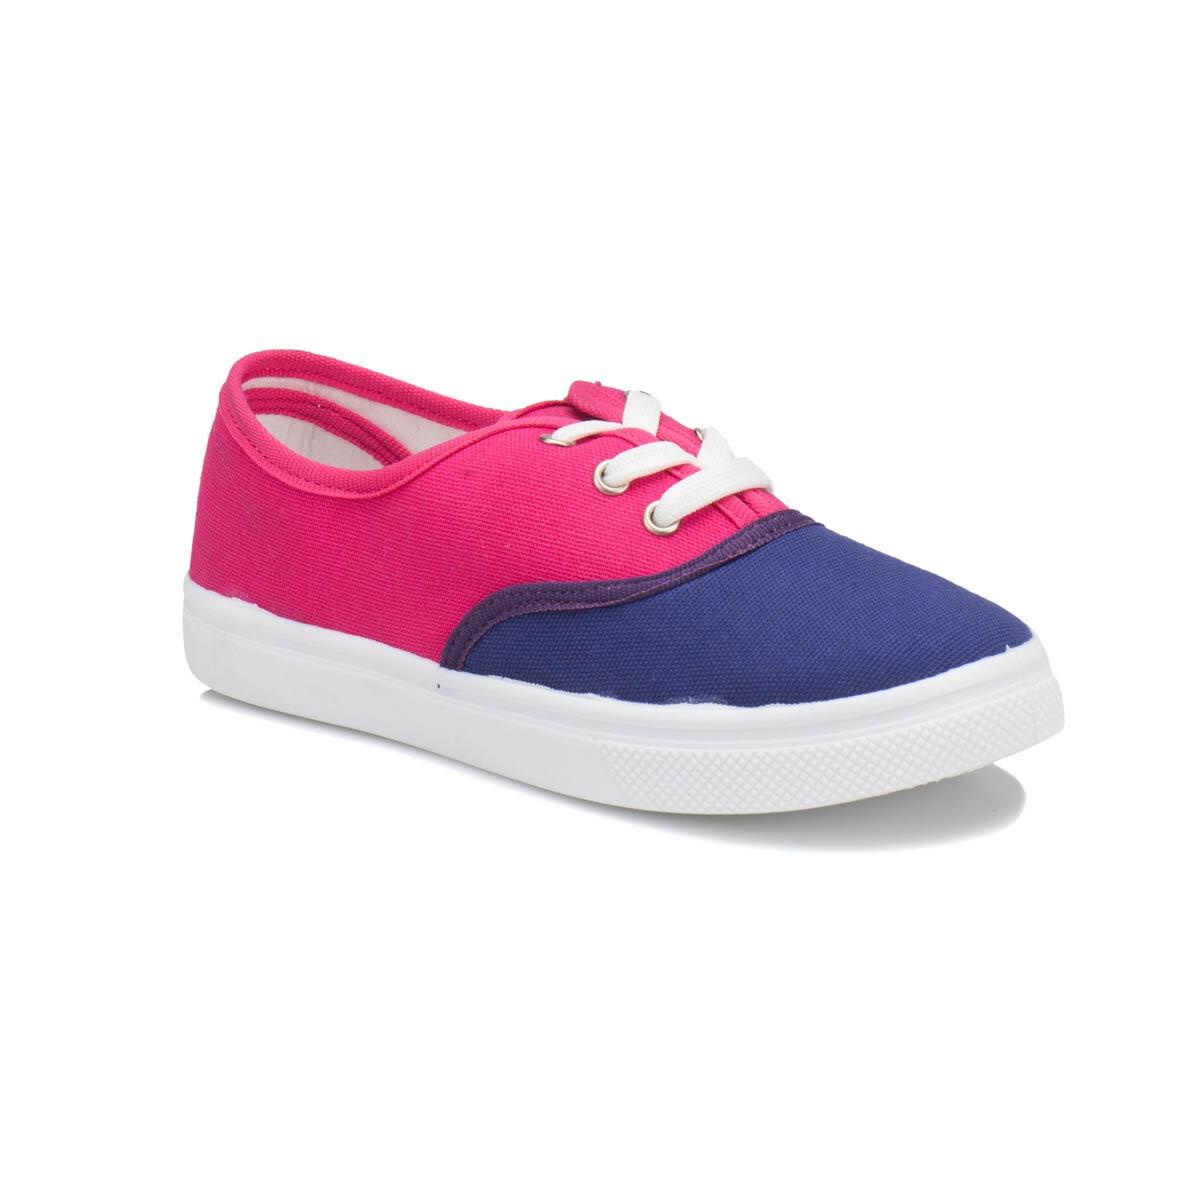 FLO GOMEZ Purple Female Child Sneaker Shoes I-Cool